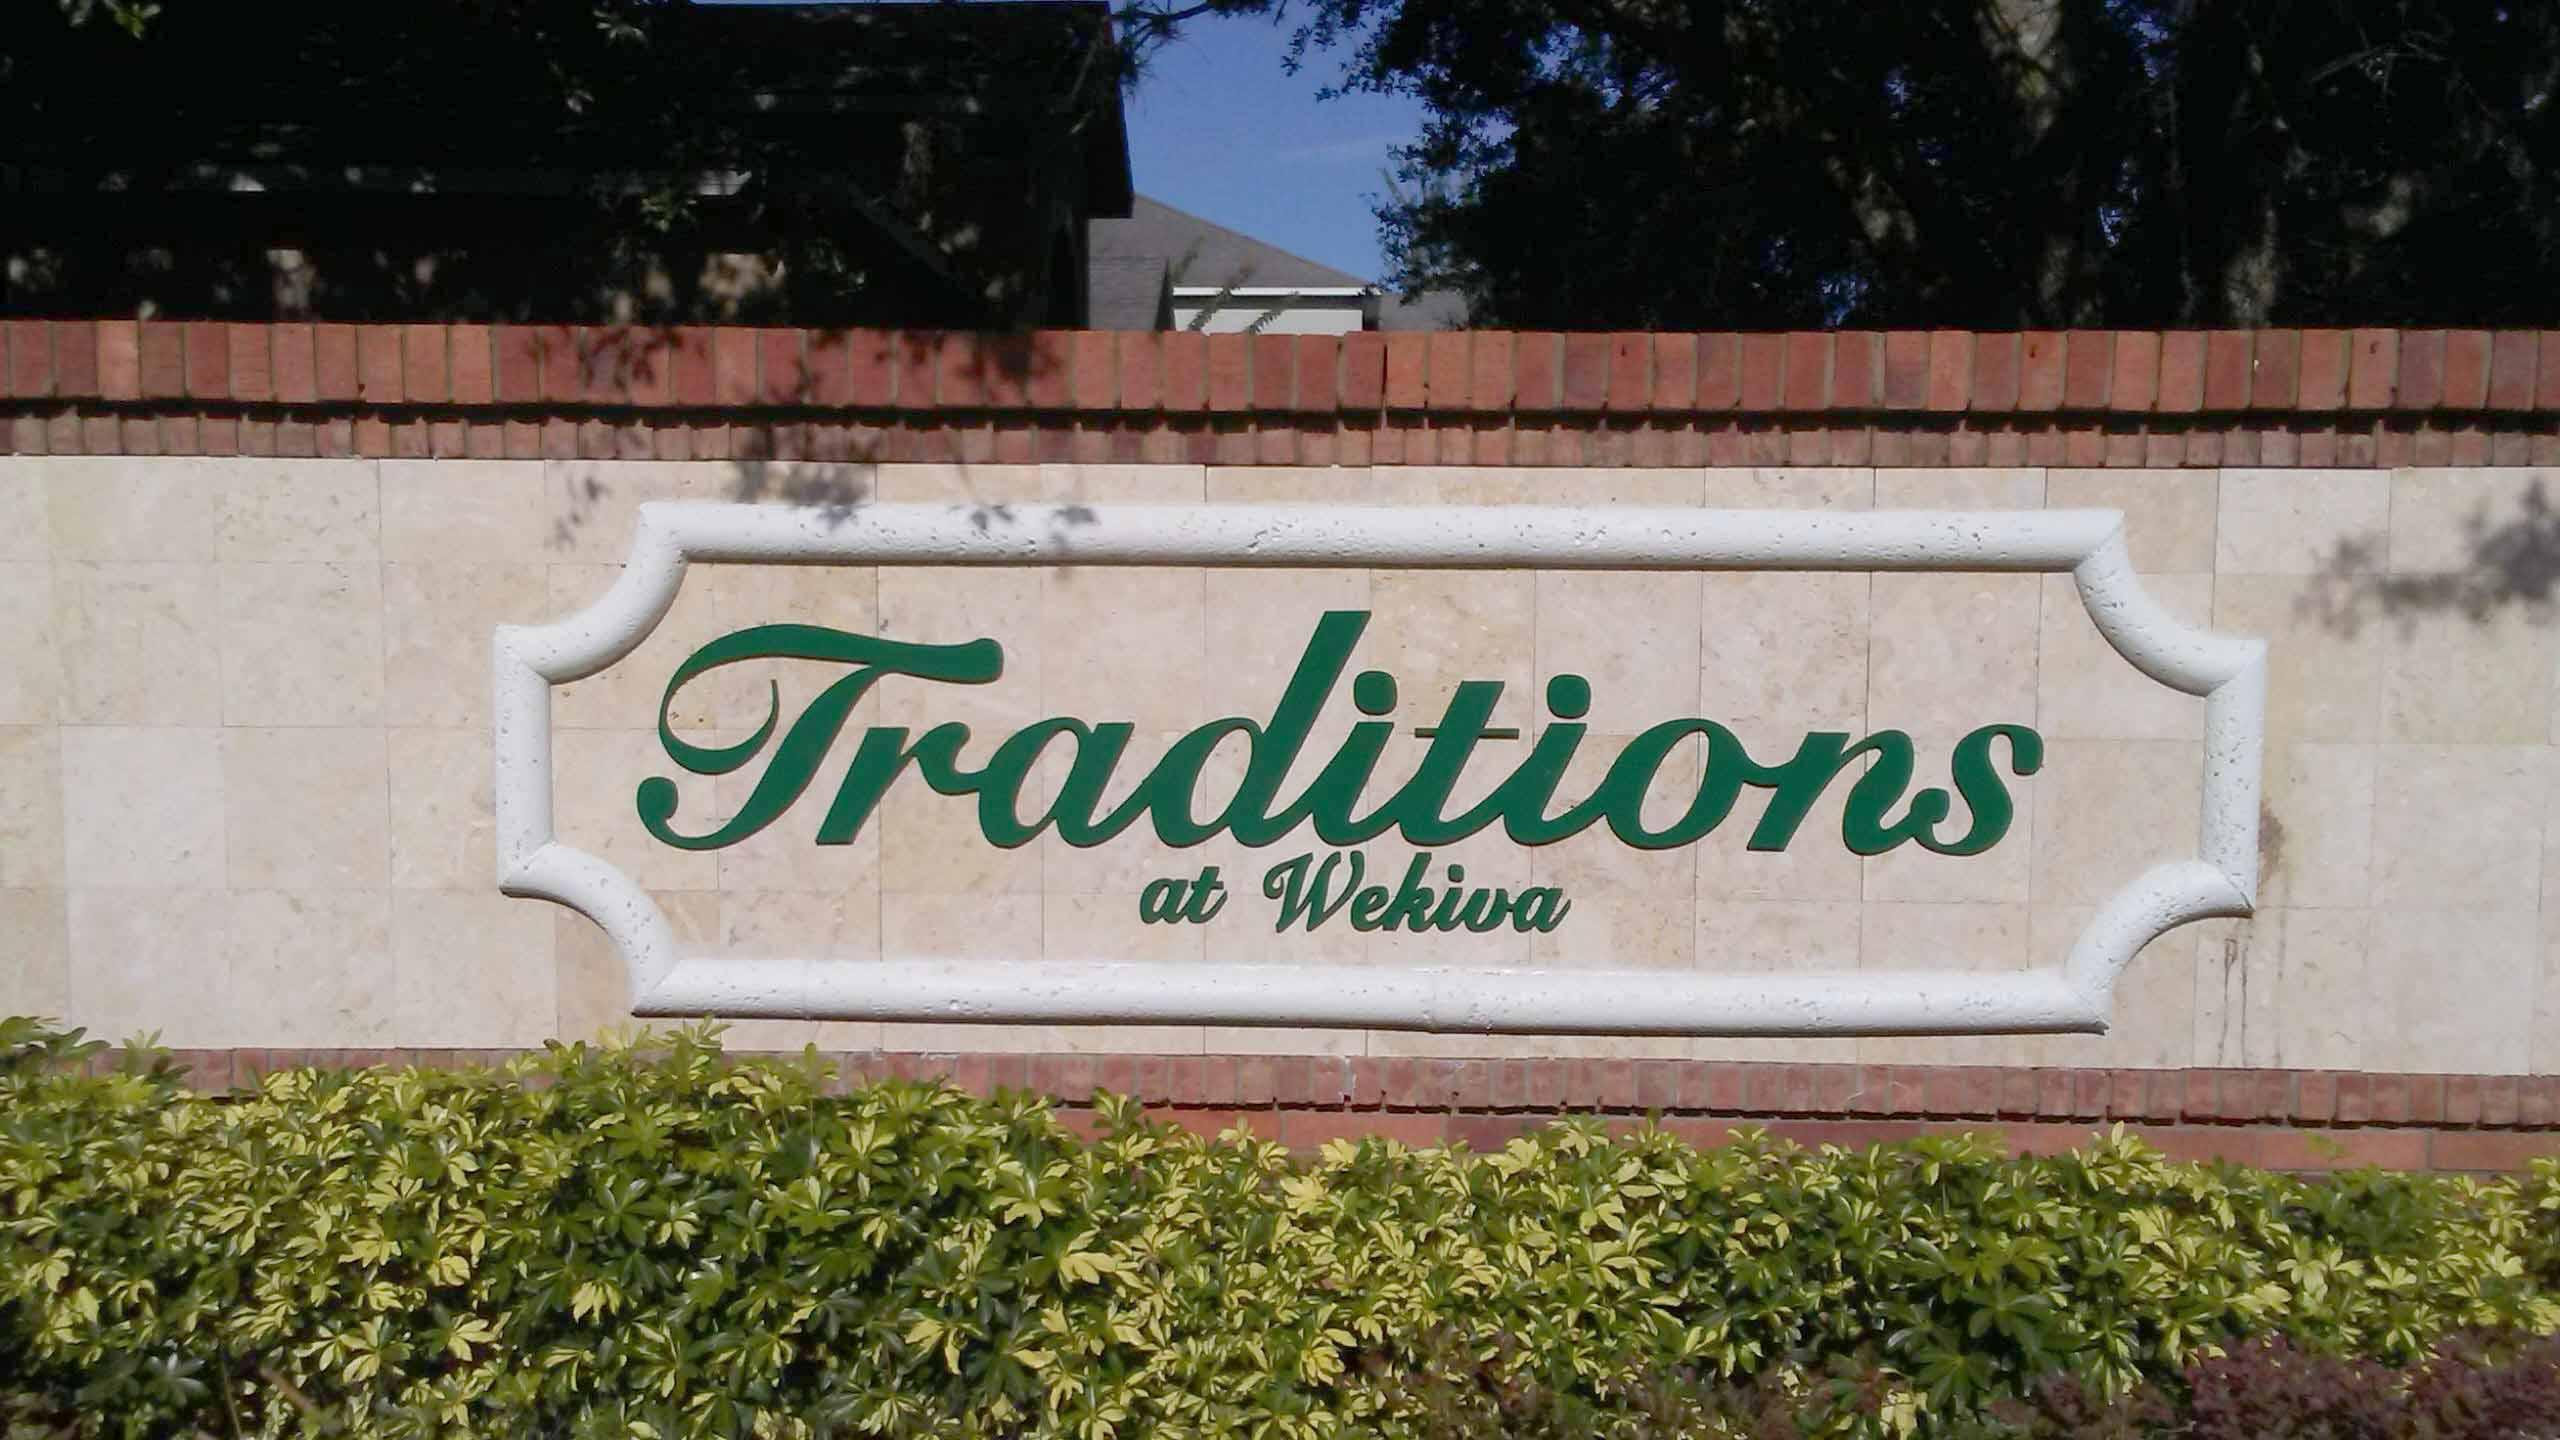 Traditions at Wekiva, Apopka, Florida 32712